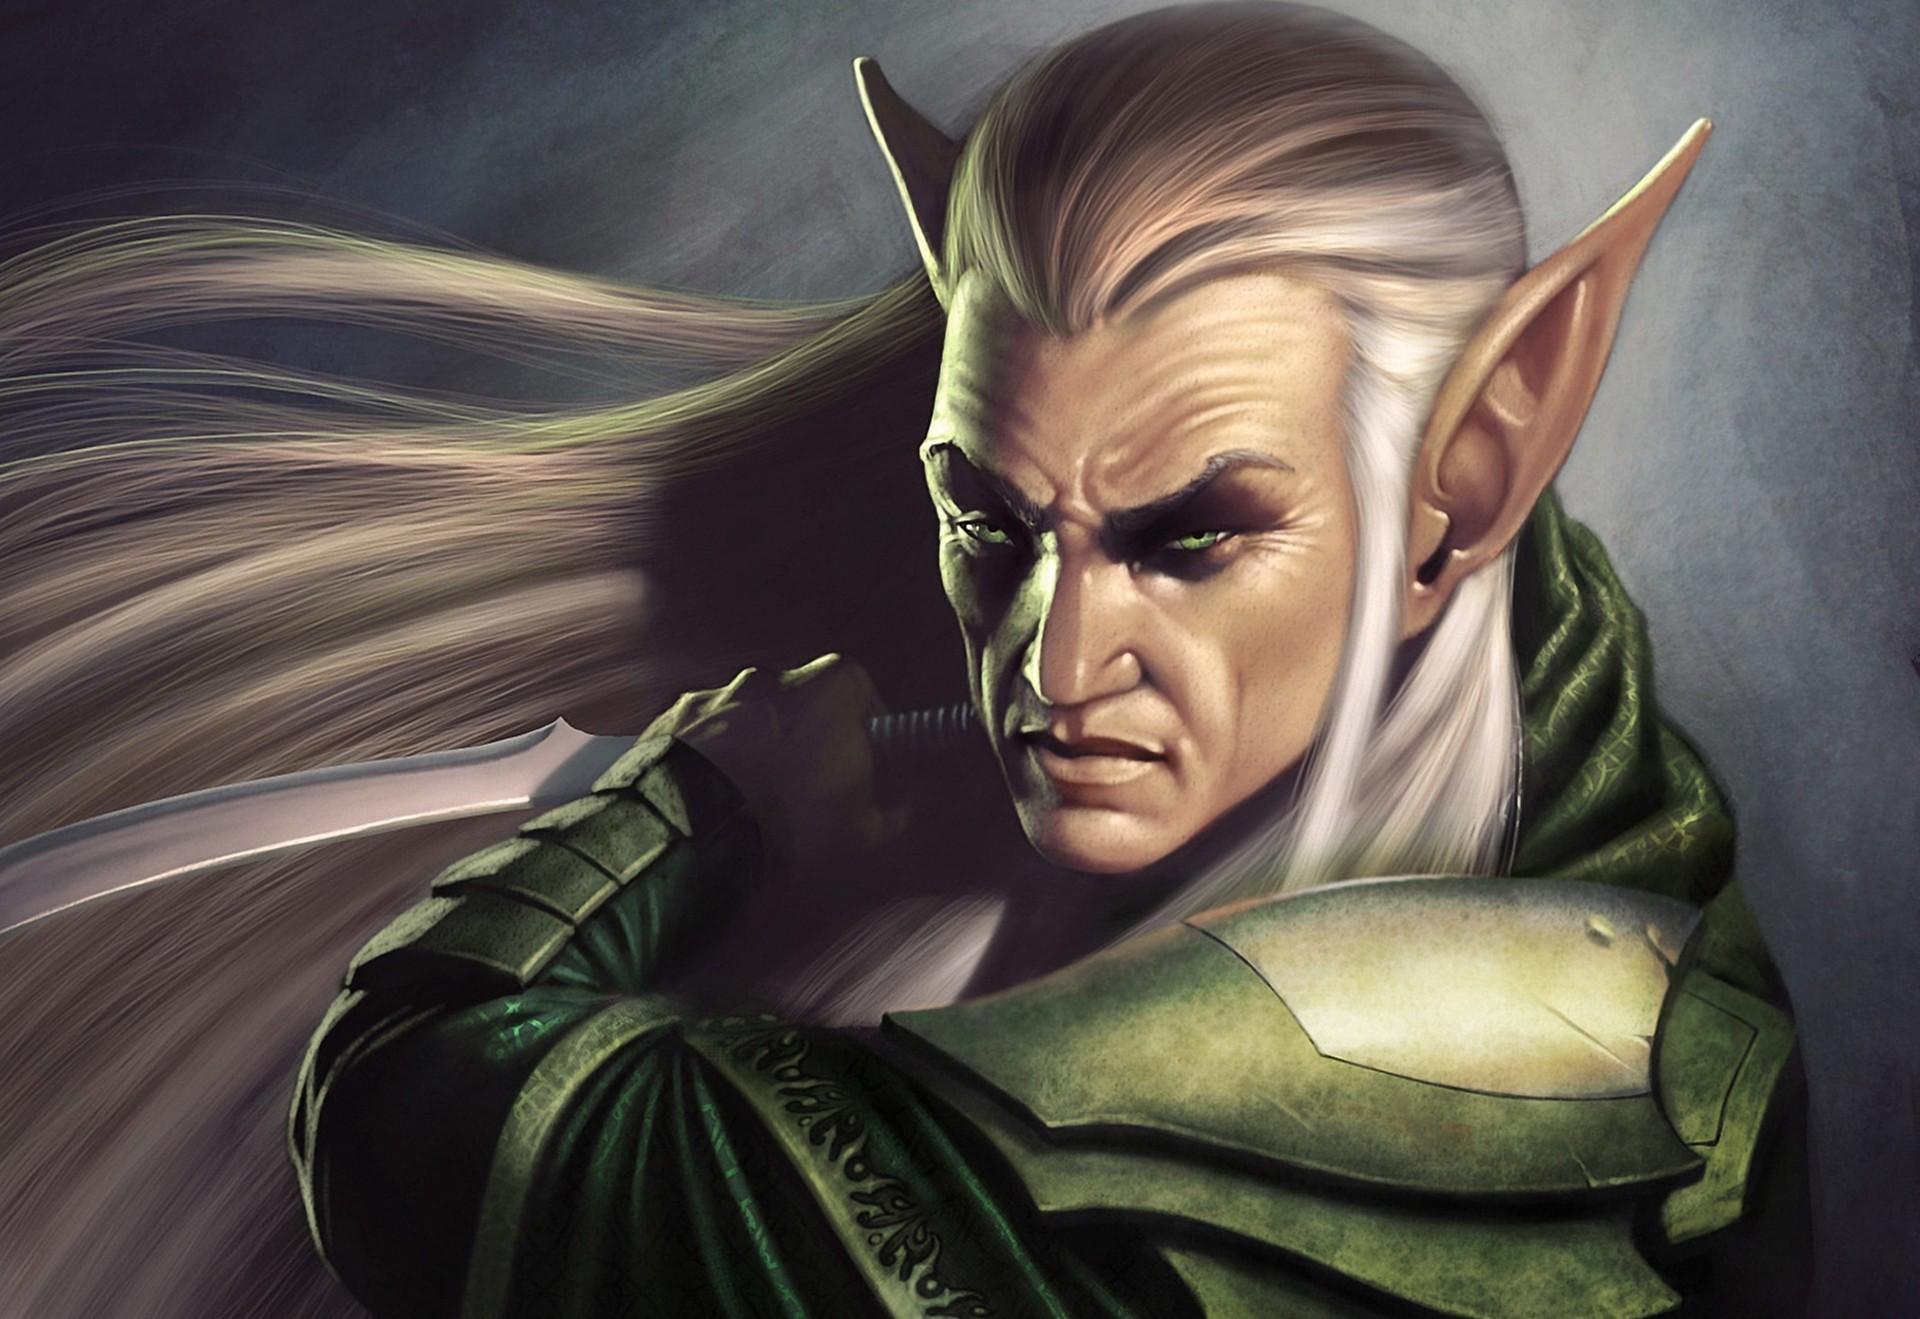 women video games nature The Elder Scrolls V: Skyrim HD wallpaper .